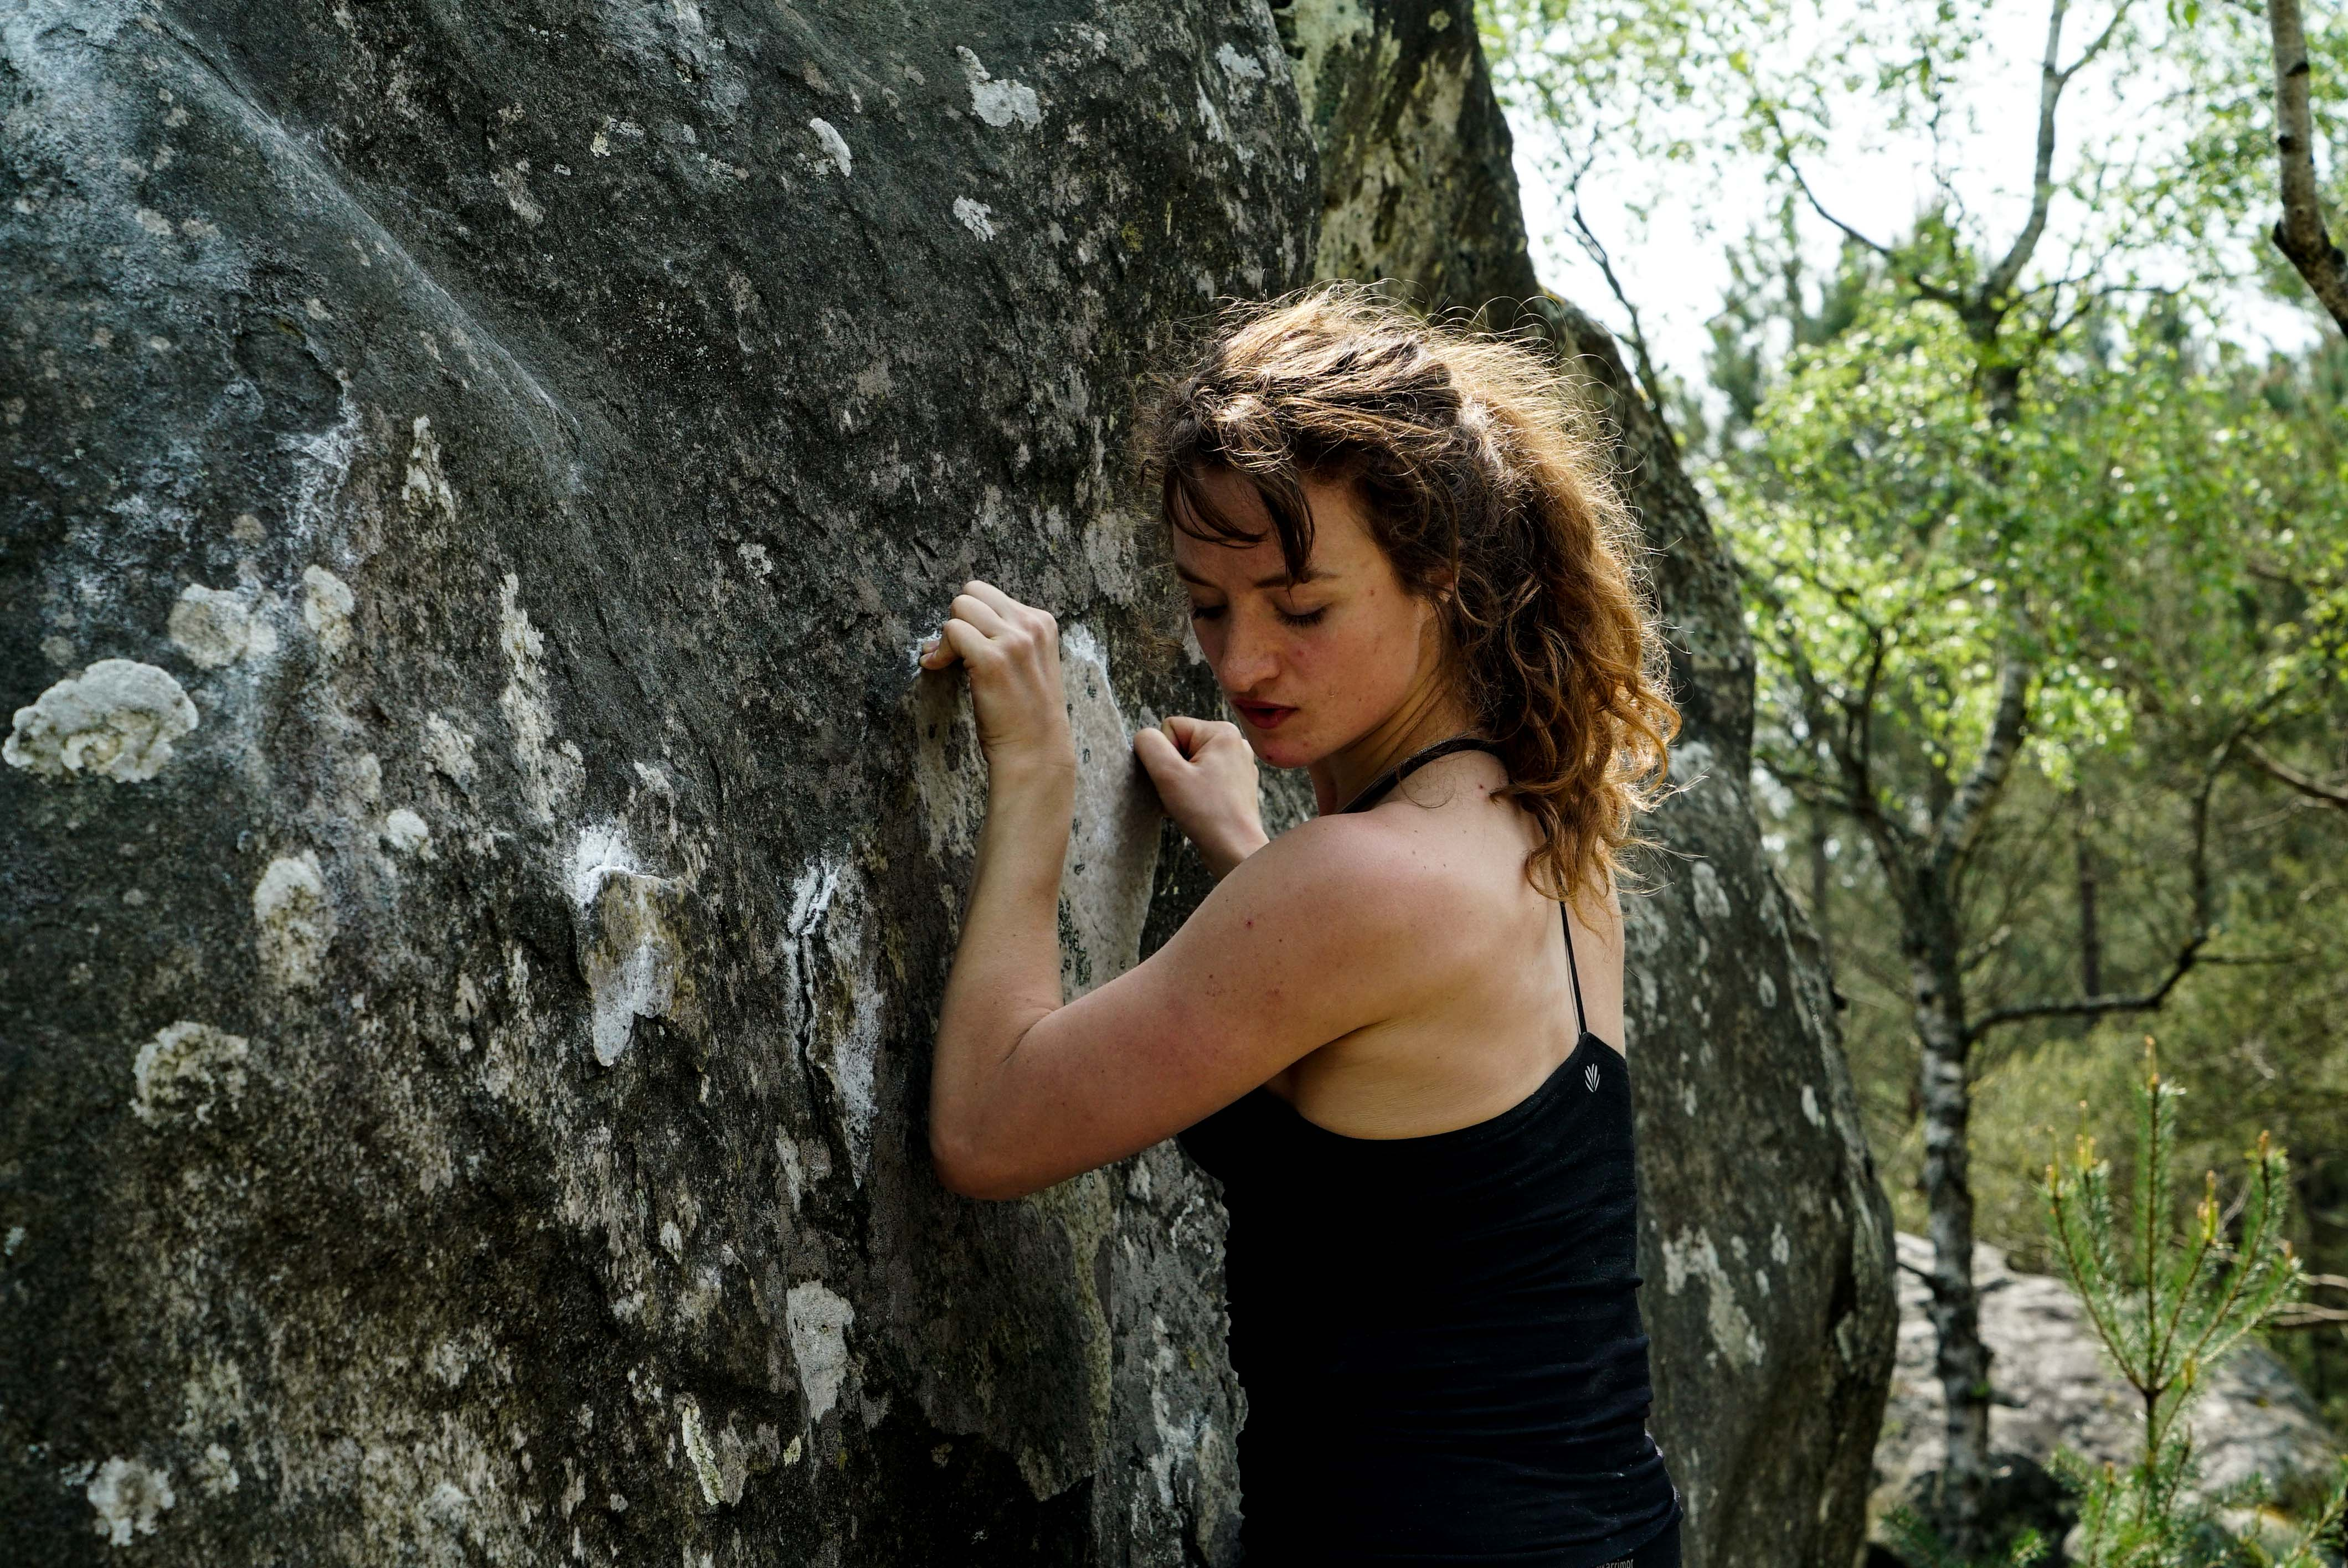 fontainbleau climbing 2016 mike brindley-78